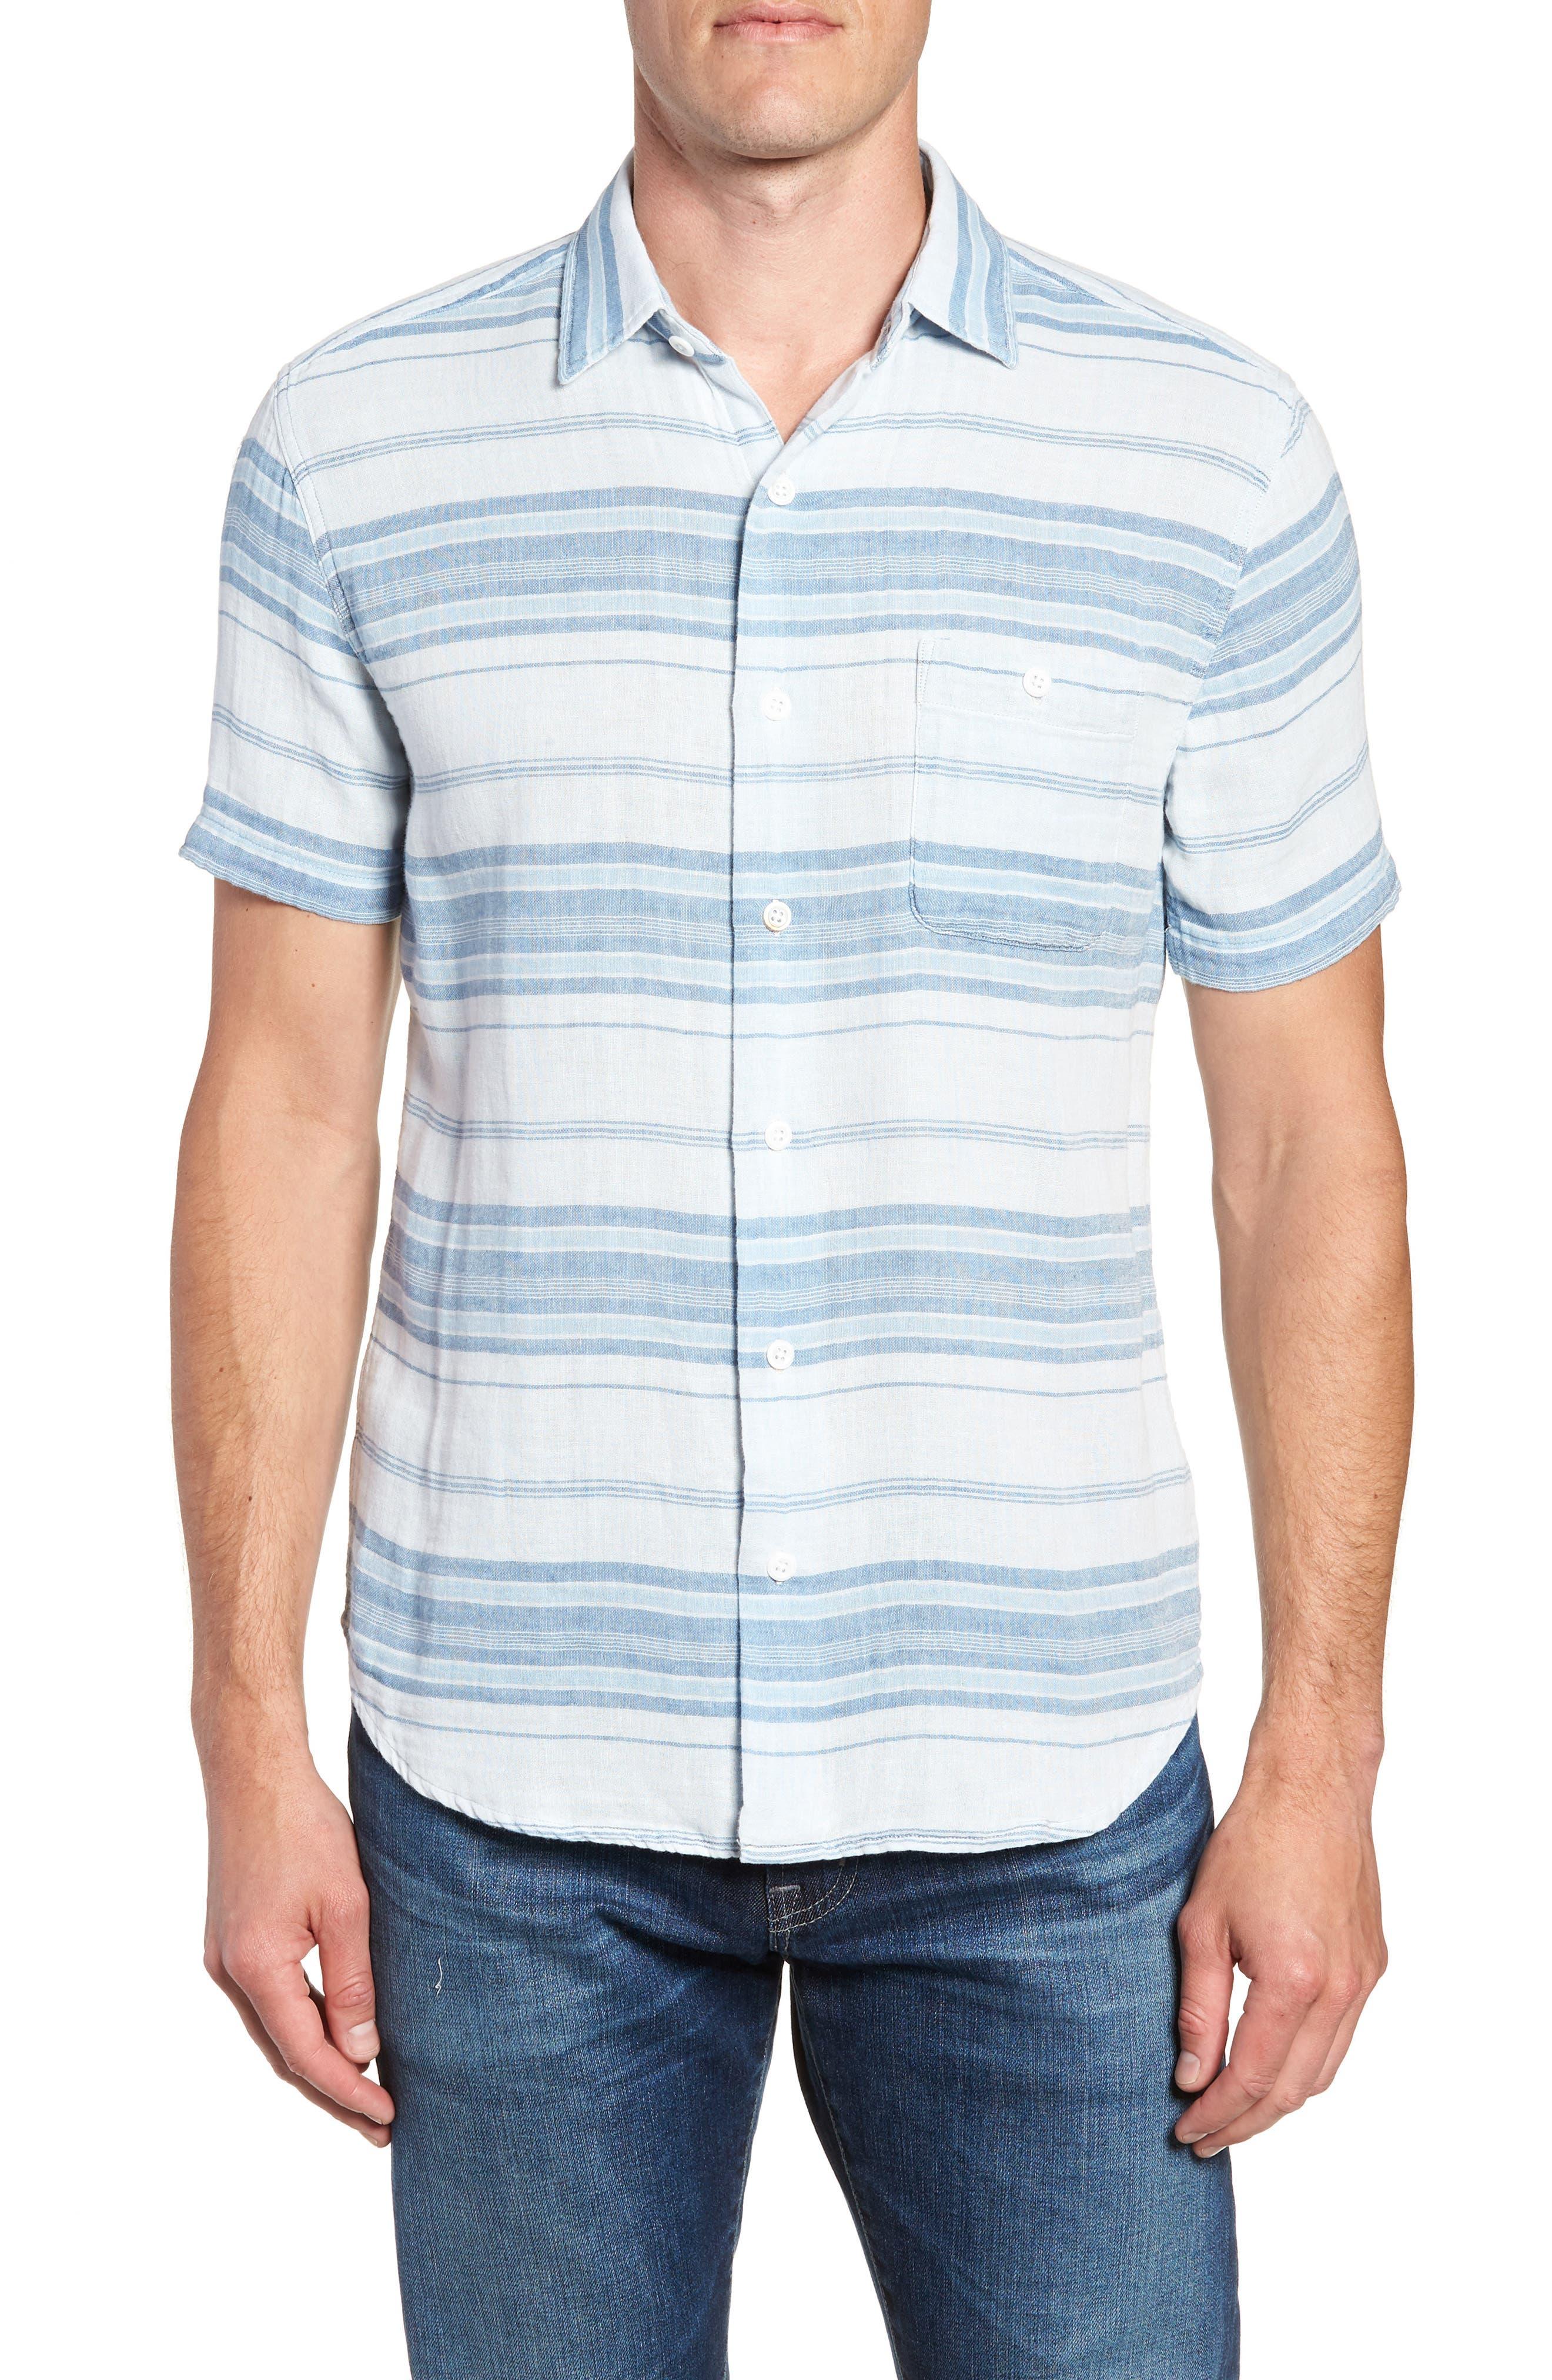 Ventura Double Cloth Short Sleeve Shirt,                             Main thumbnail 1, color,                             Light Indigo Serape